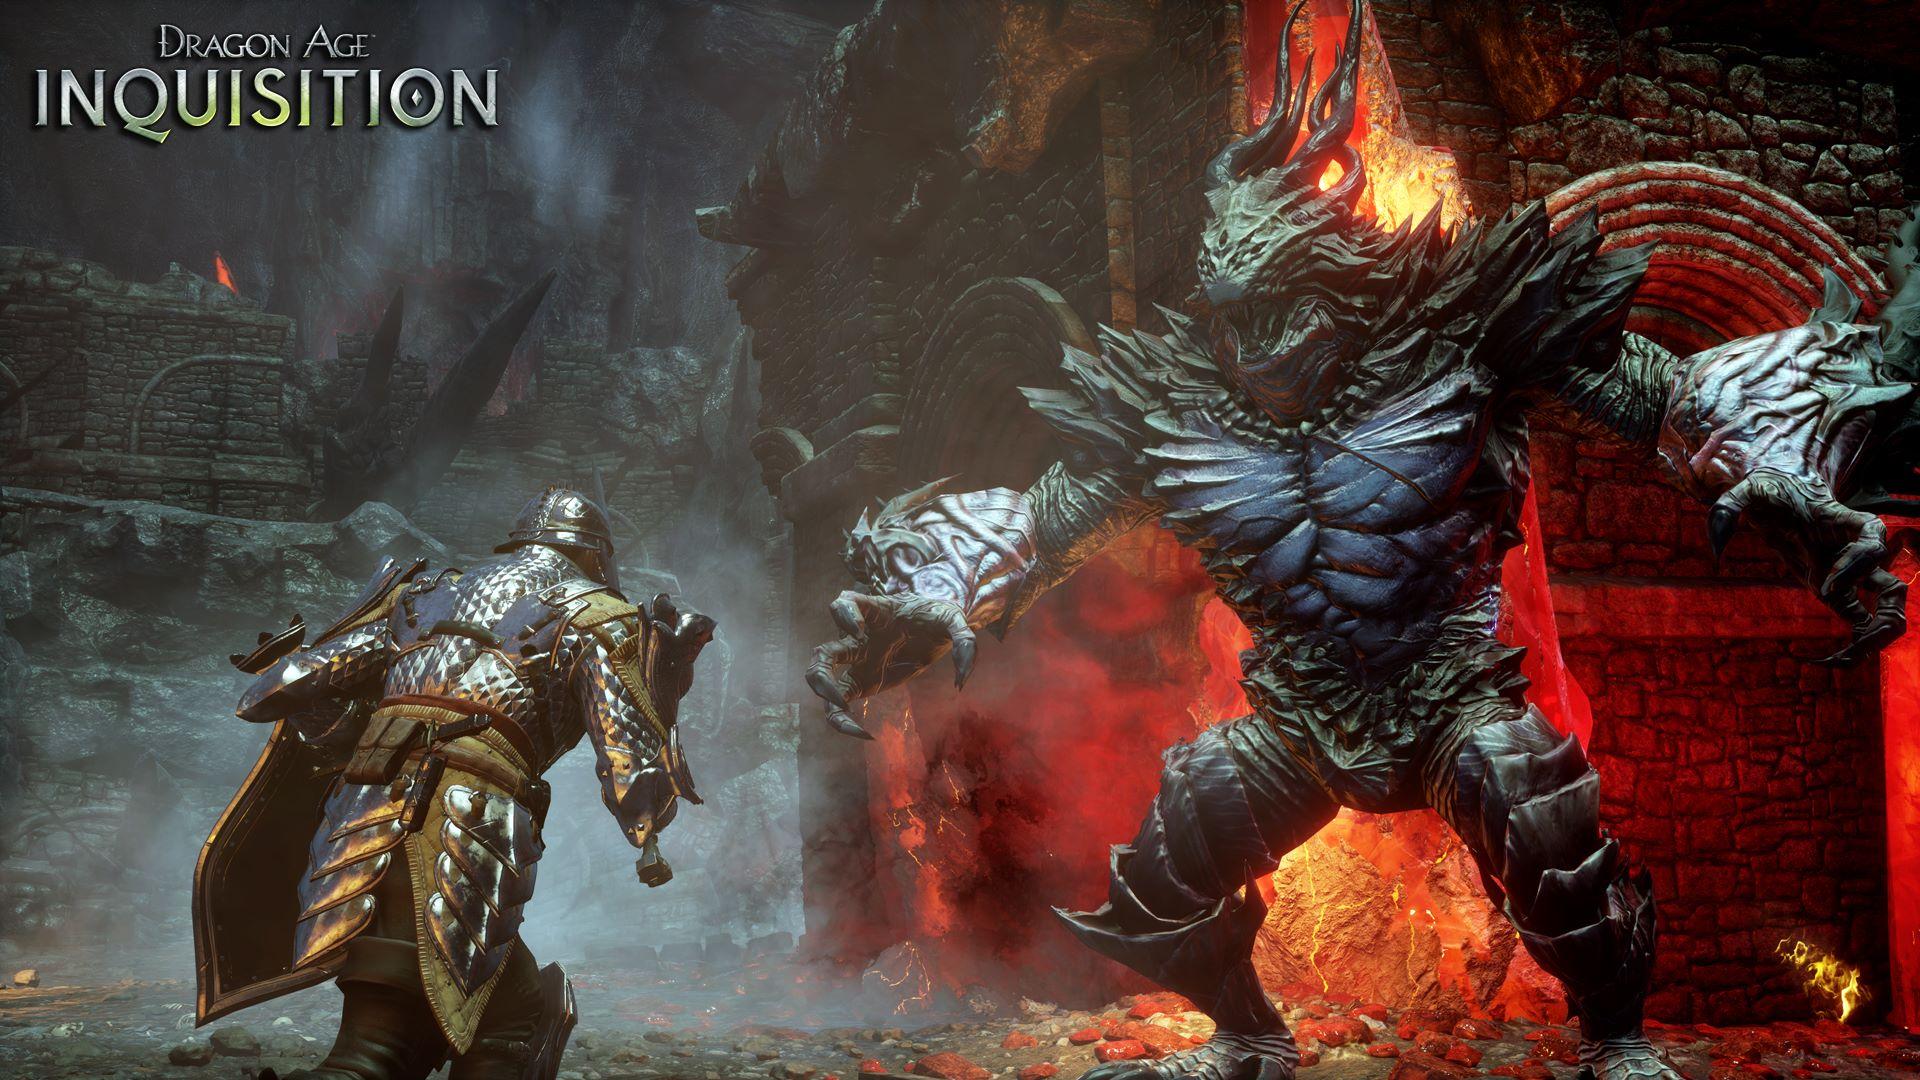 dragon-age-inquisition-goty-pc-screenshot-3